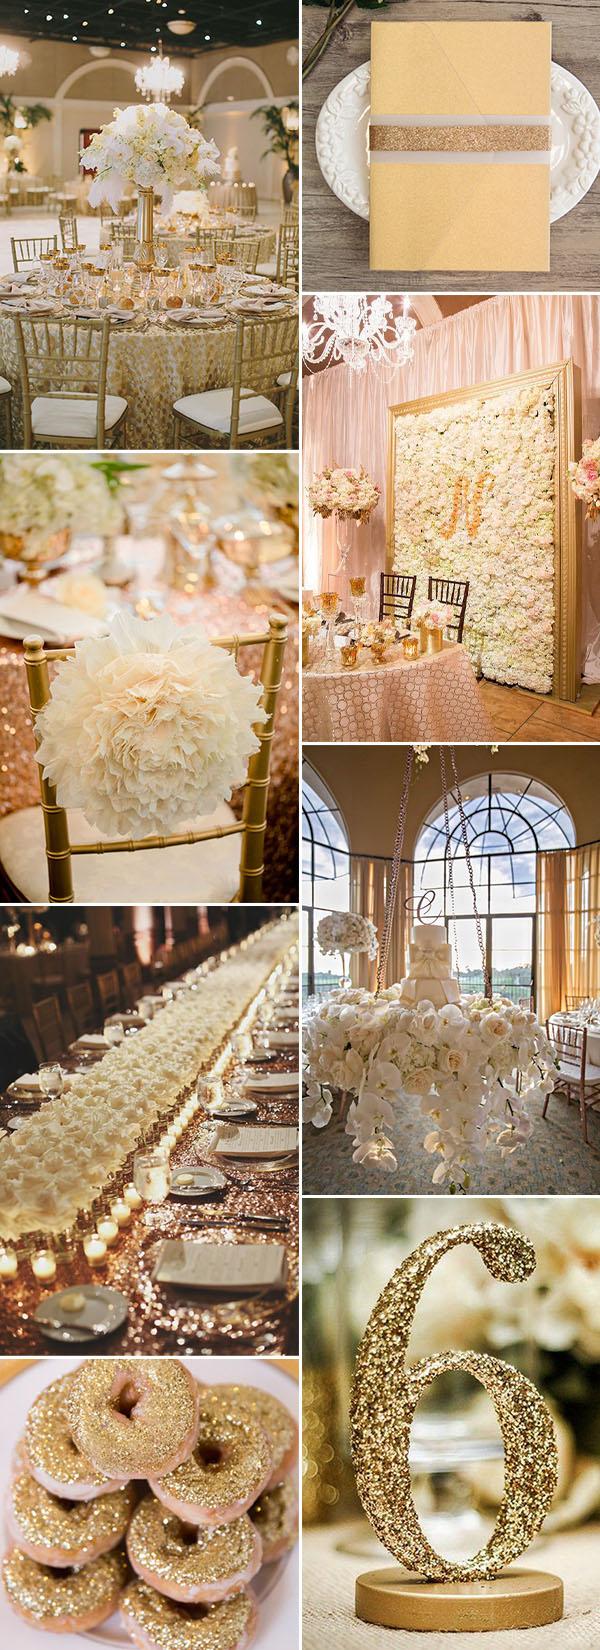 Sursa foto: NV Linens, Wedding Chicks, Tyler Vu Photography, Elizabeth Anne Designs, Vianisies Enchanted Florist/, SMP, Confetti Day Drems